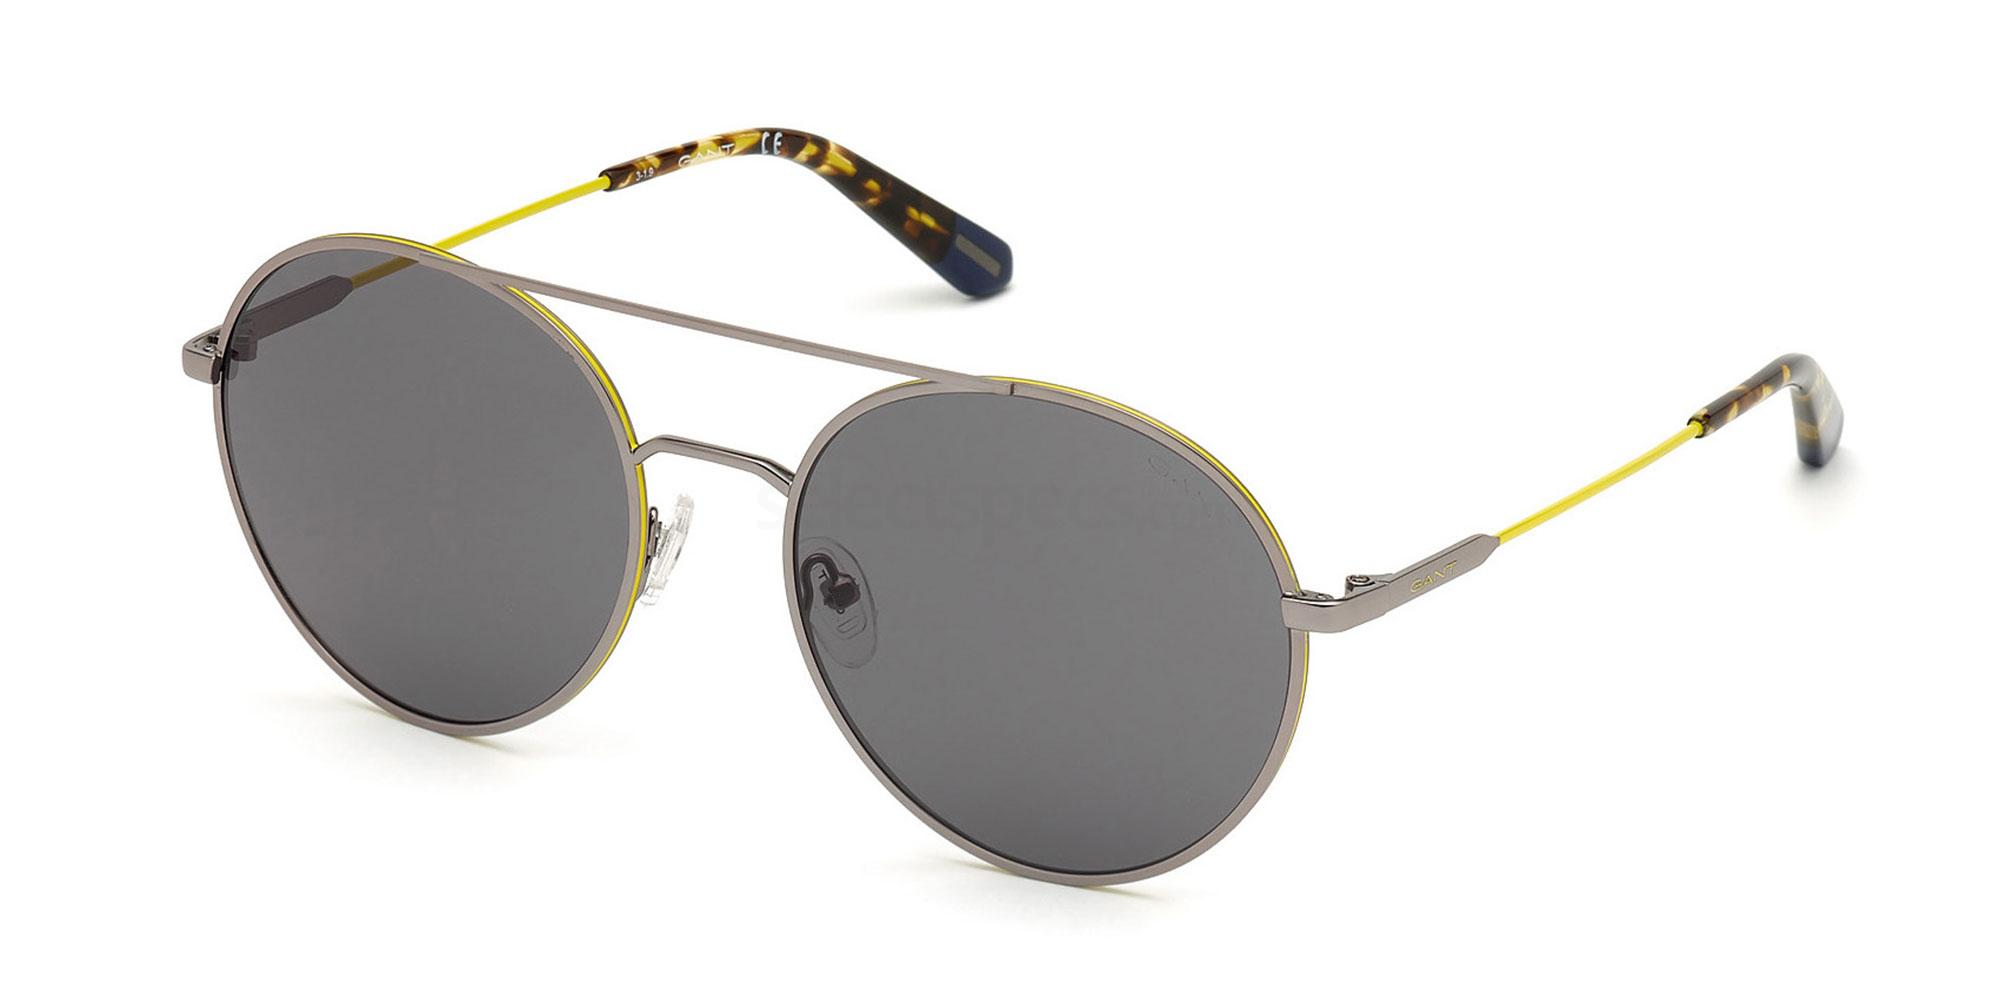 08A GA7117 Sunglasses, Gant